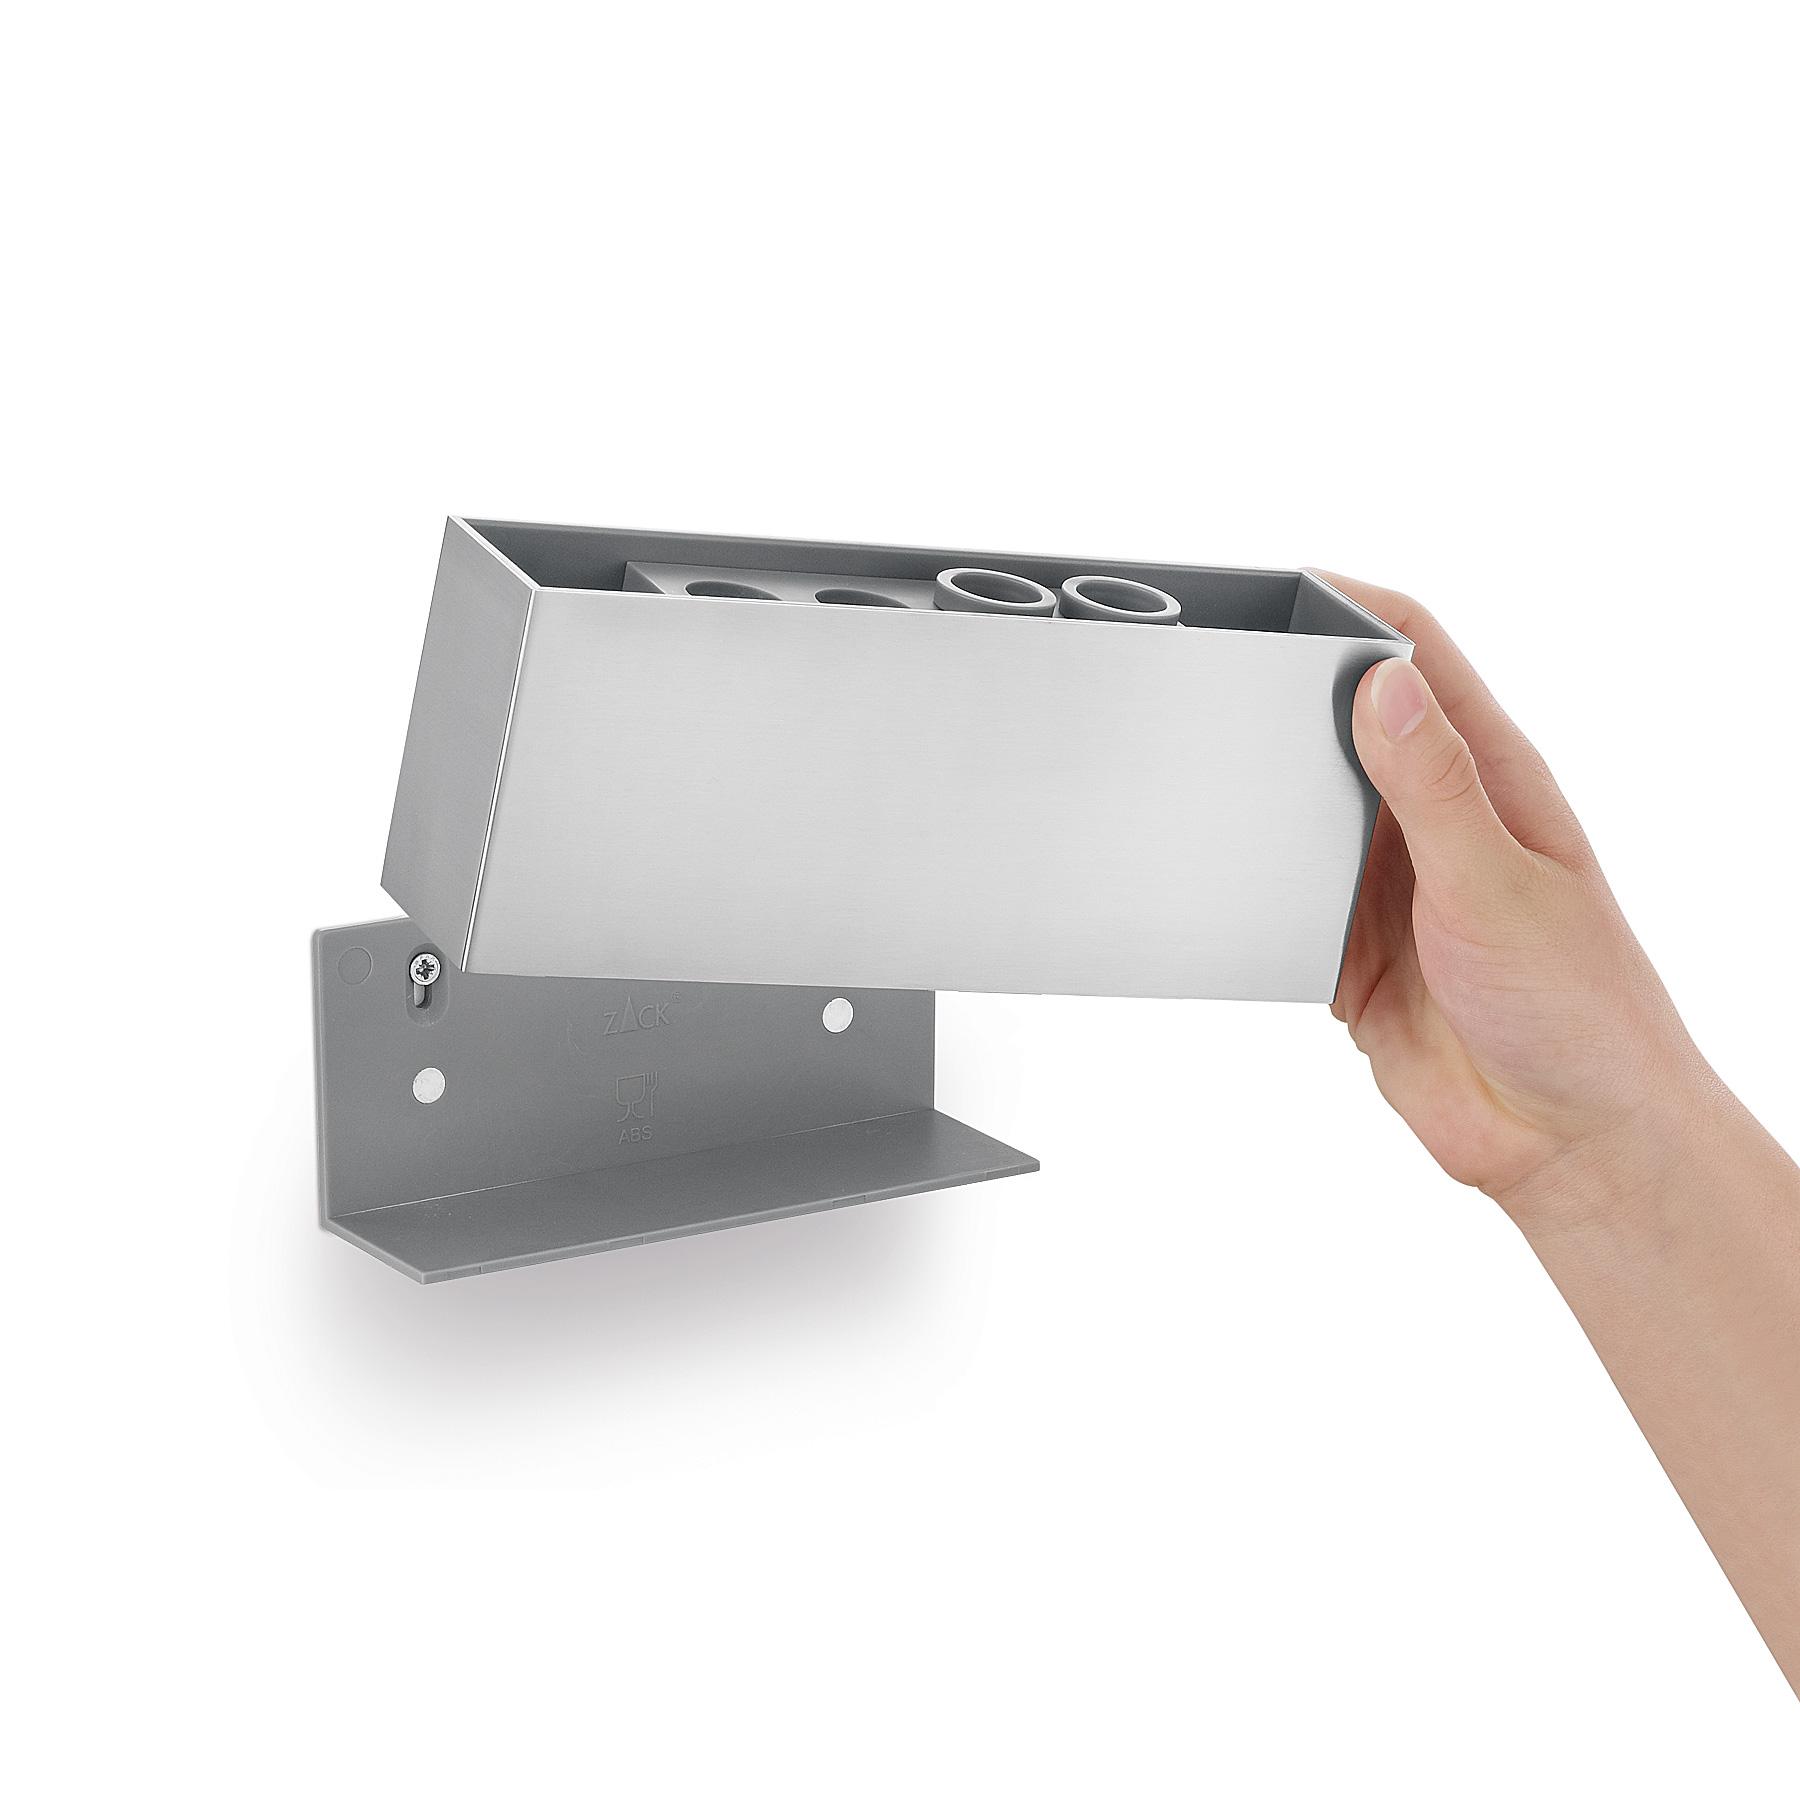 zack xero 40 020 zahnb rstenhalter f r elektrische. Black Bedroom Furniture Sets. Home Design Ideas